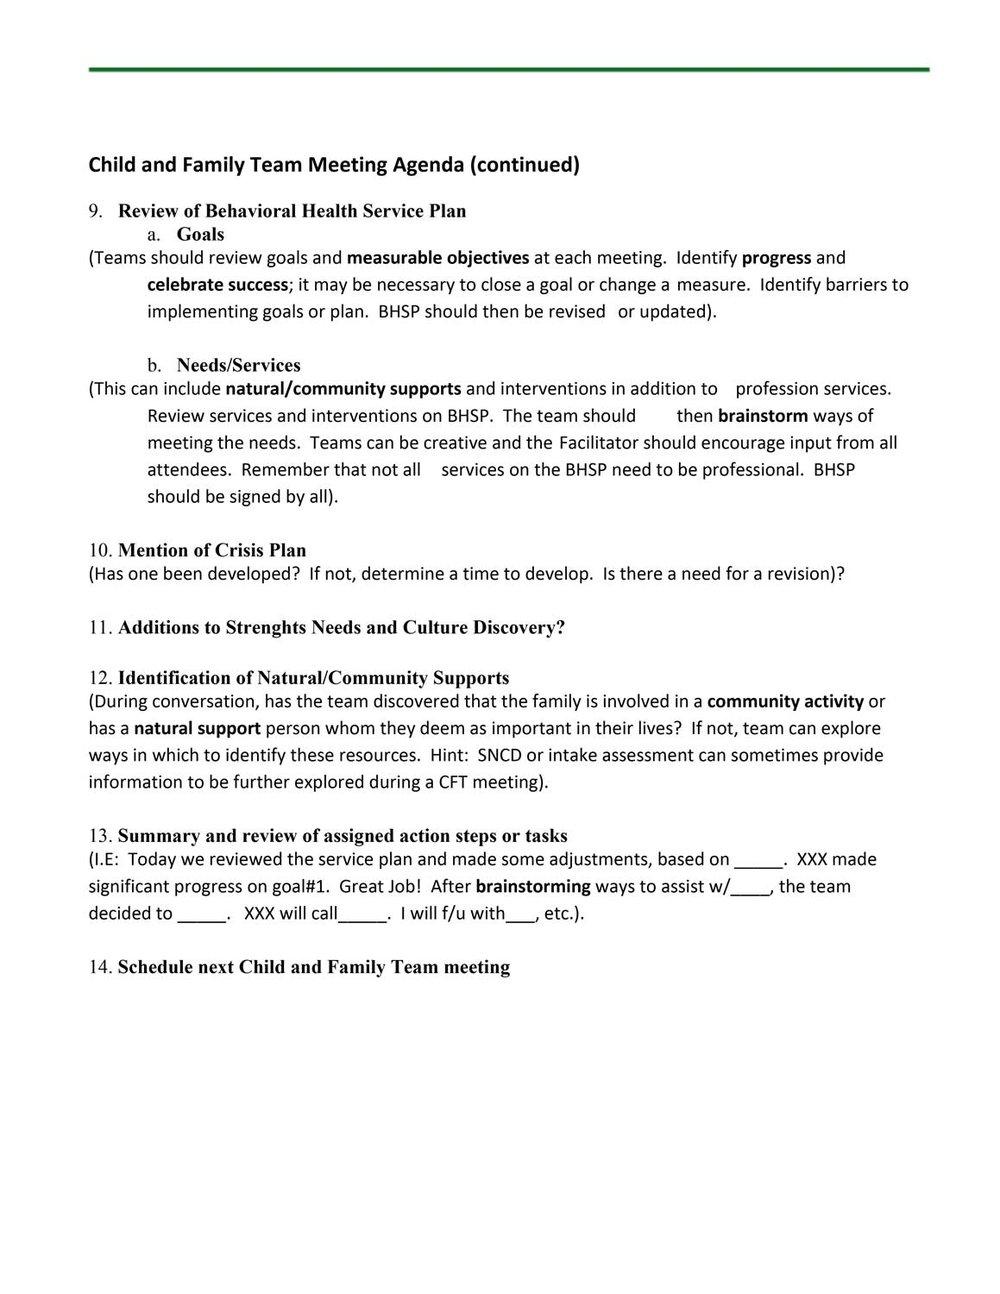 Agenda_Page-2.jpg